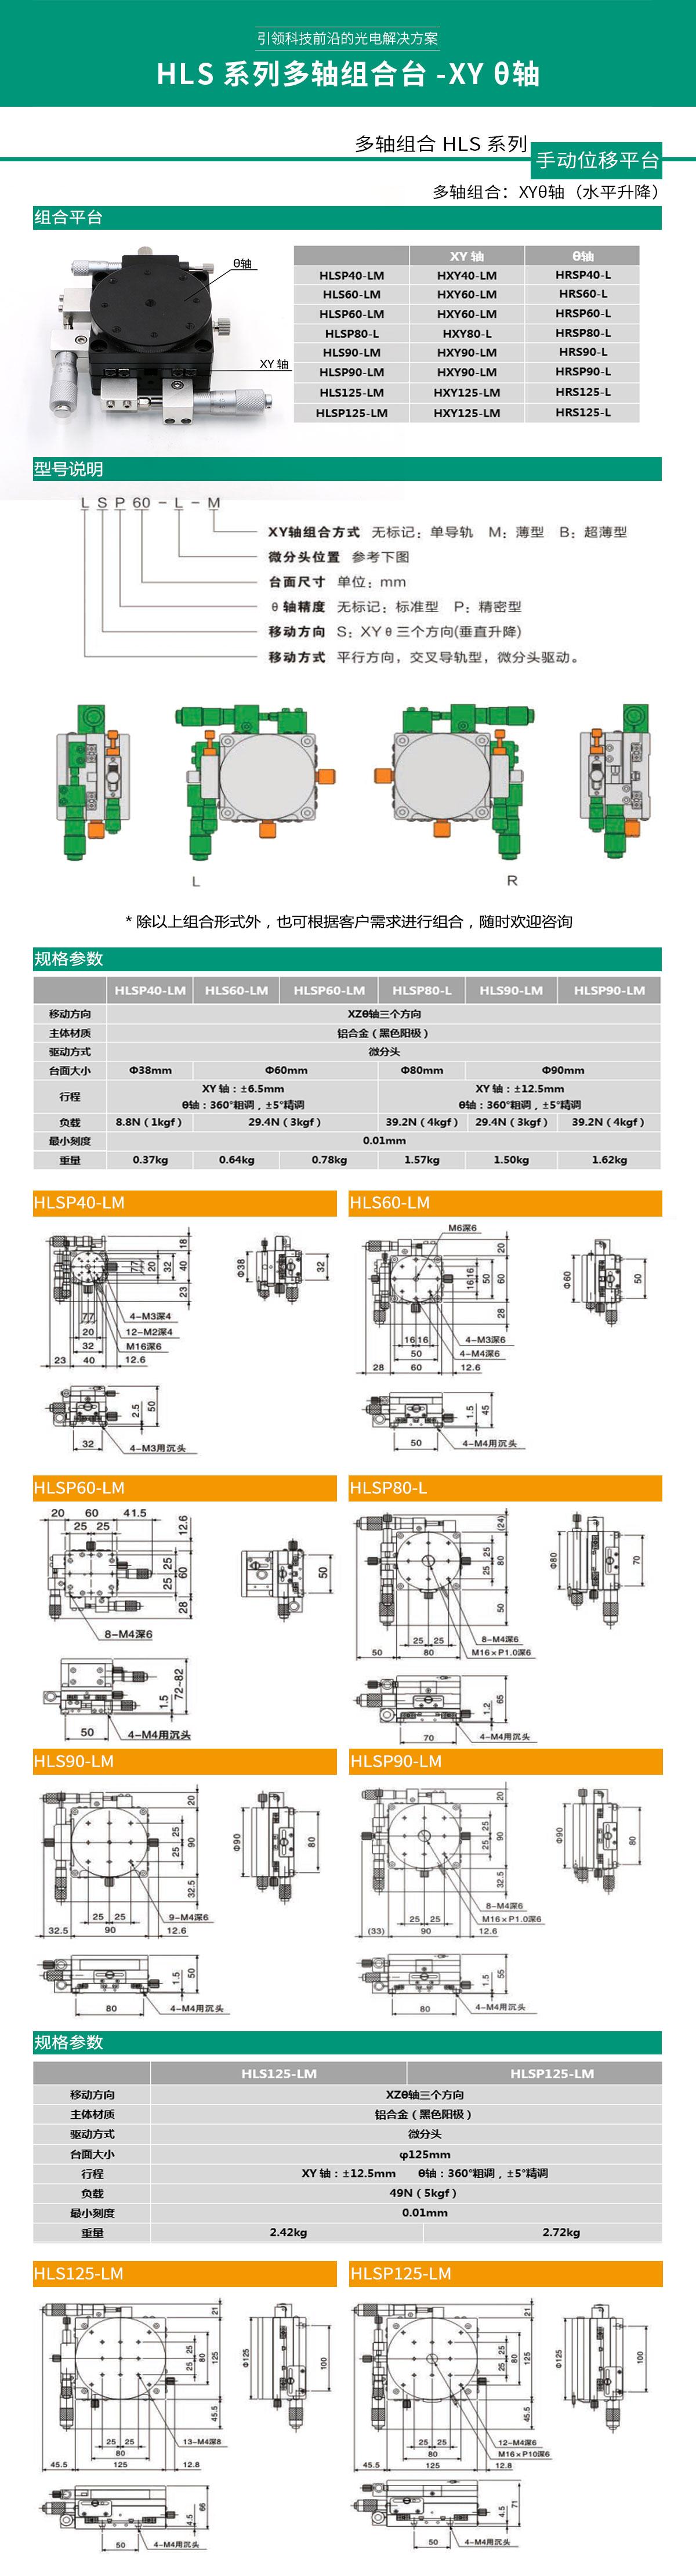 HLS系列多轴组合台-XY-θ轴